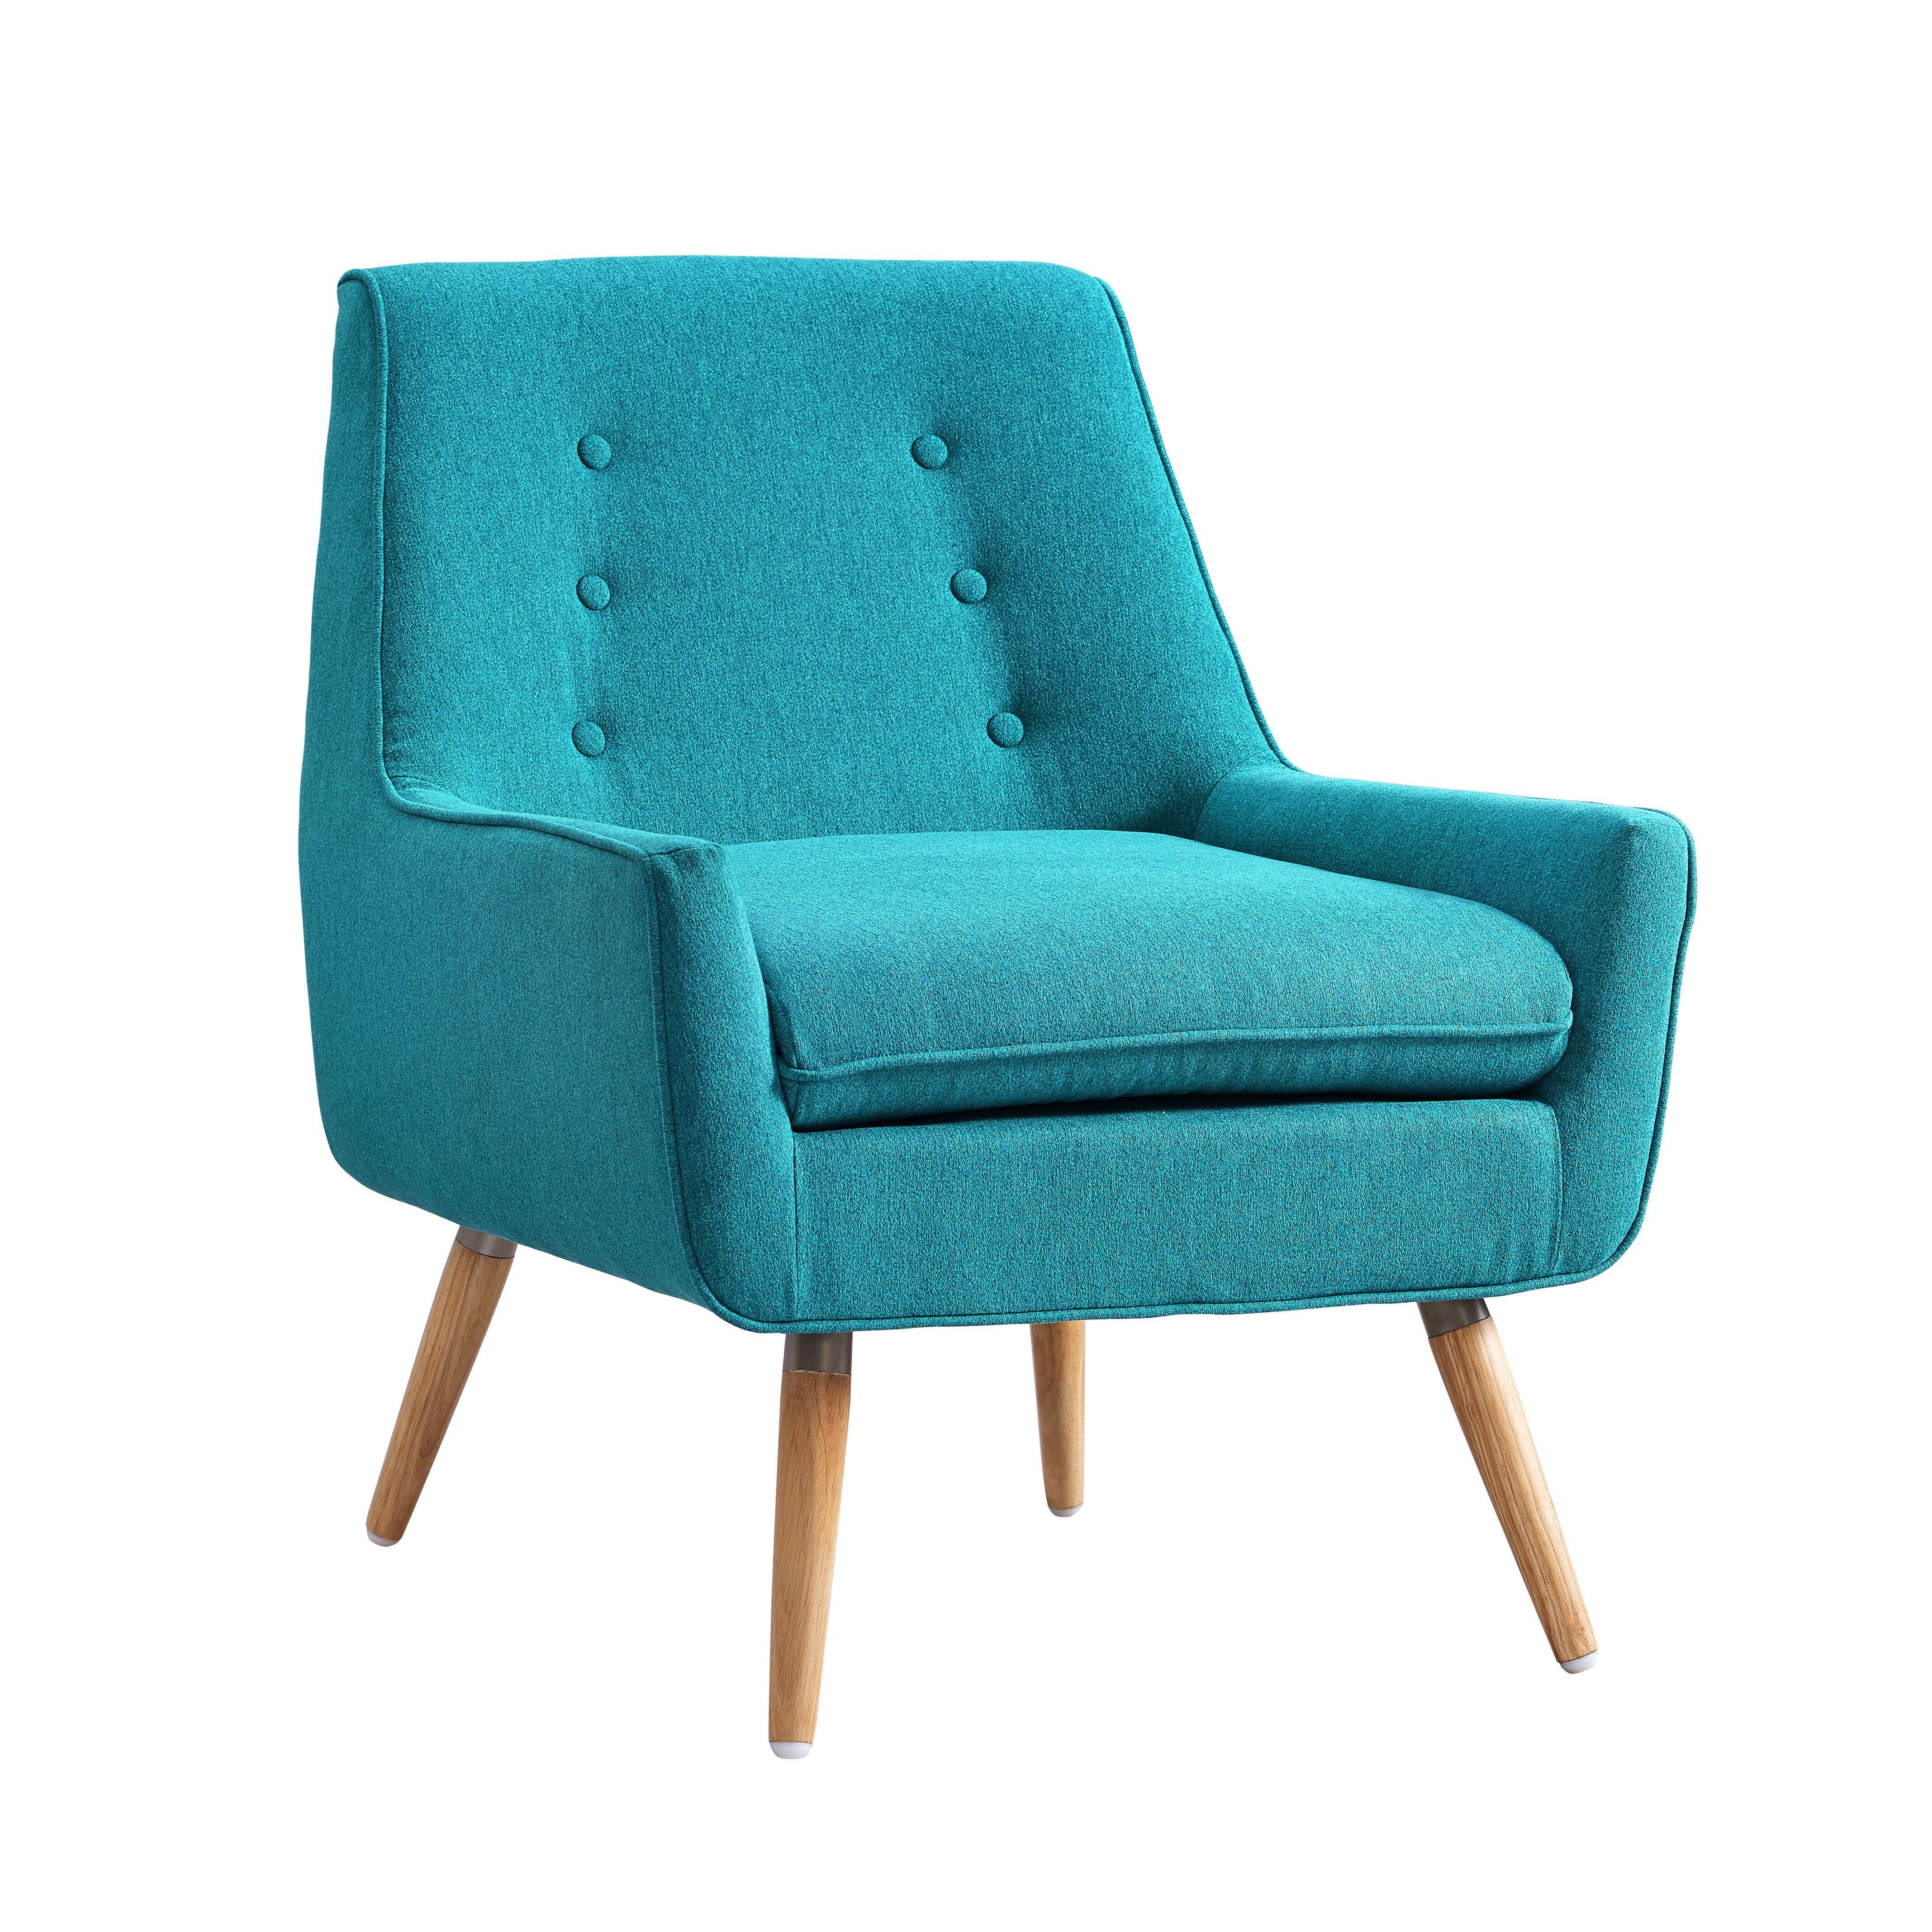 Picture of: Children S Cushions Covers 3x Ikea Malinda Chair Cushion Red Seat Cushions Home Dining Chairs Home Furniture Diy Ot Baieducotentin Fr